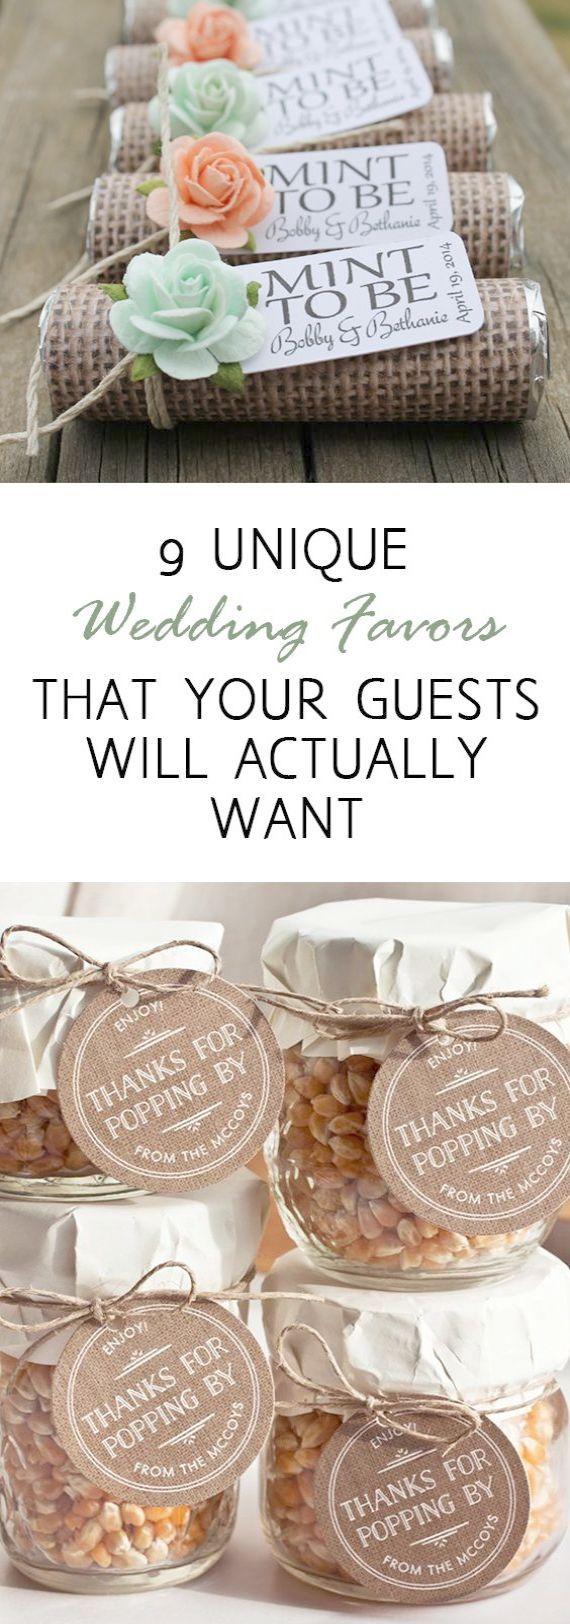 Wedding ideas simple small weddings cool wedding present ideas